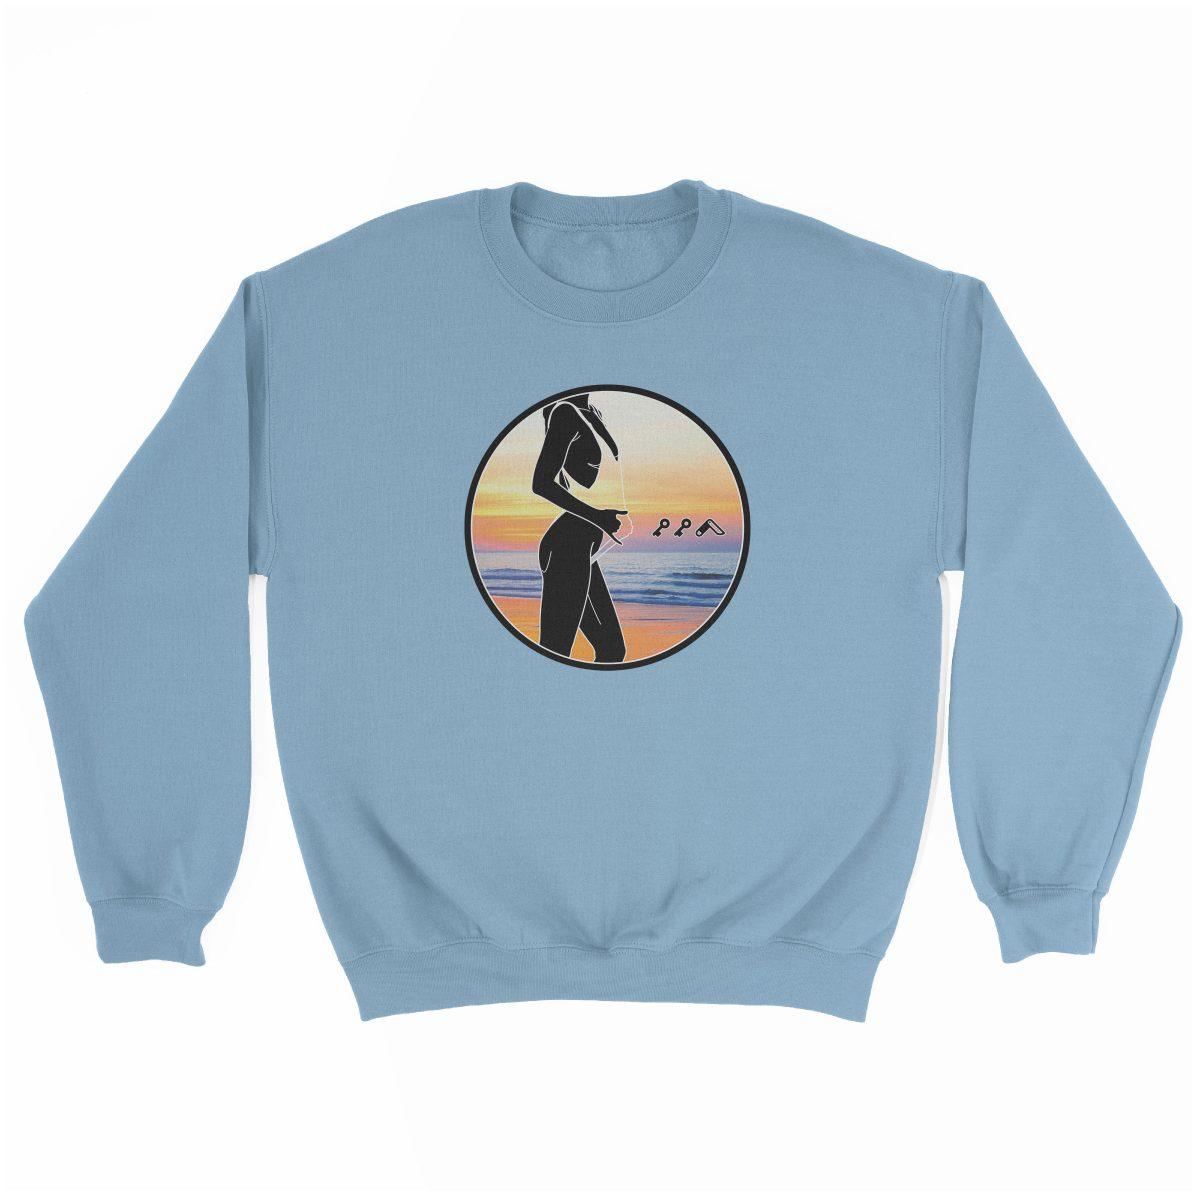 """BAE WATCH"" music festival beach sweatshirt in light blue"